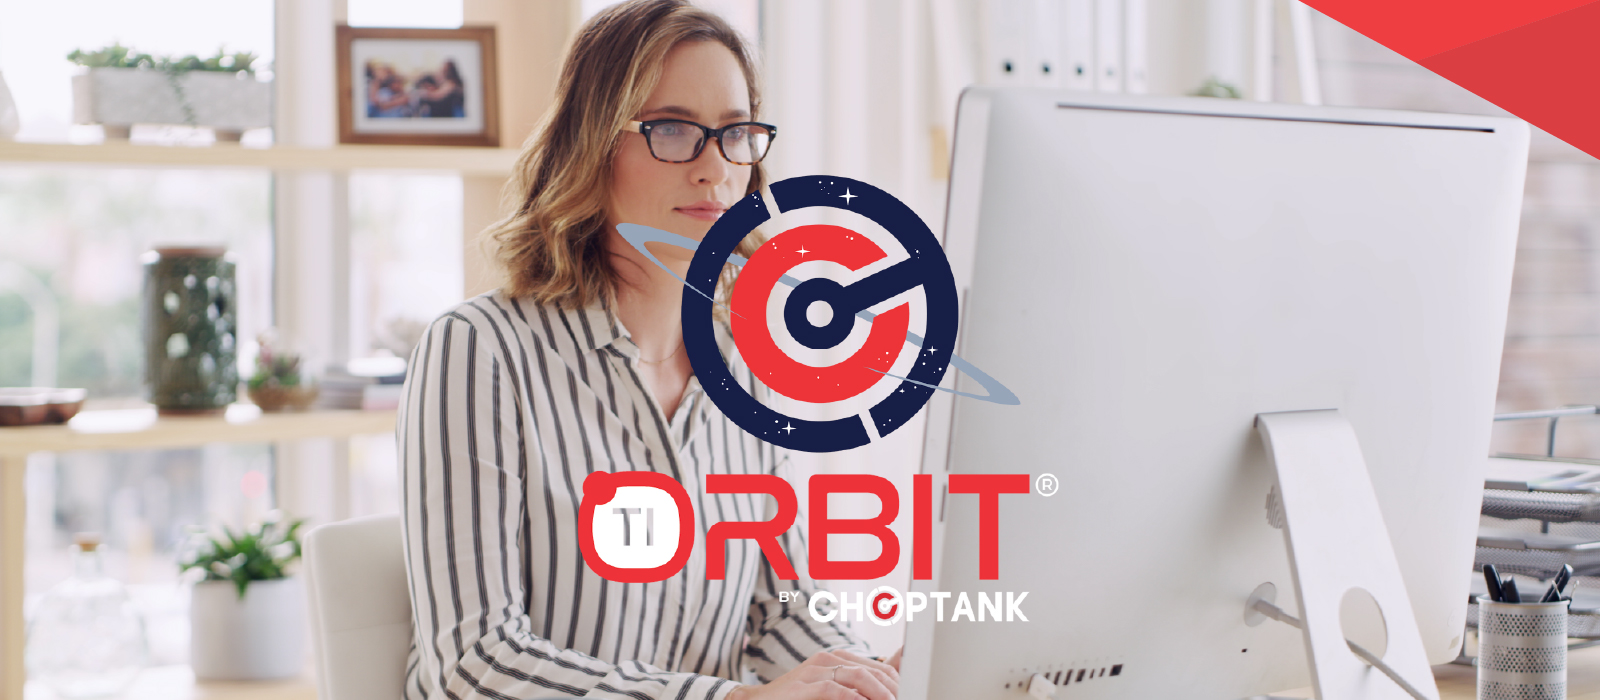 orbit video header